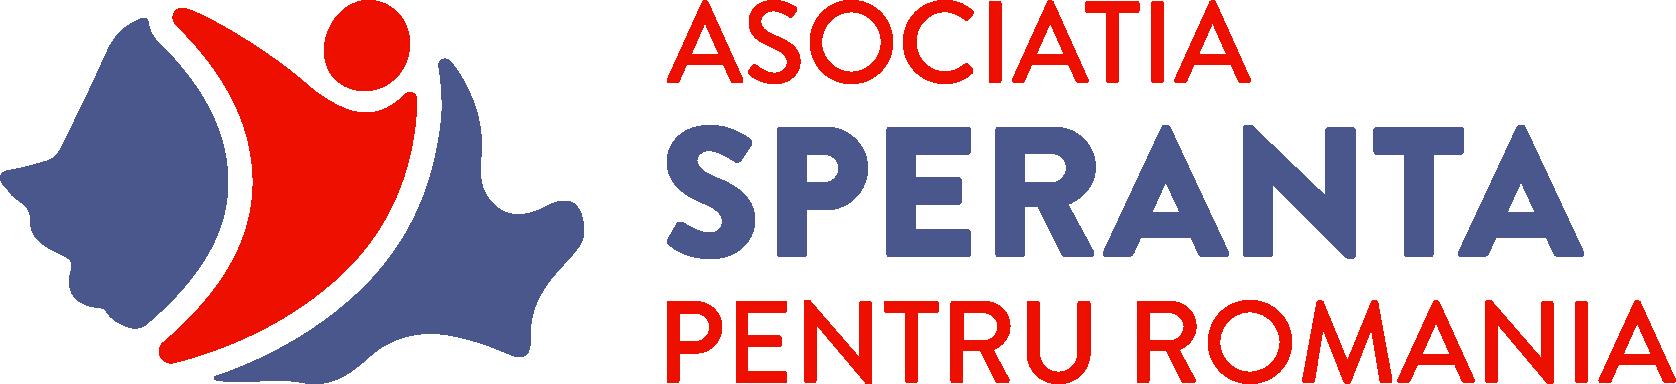 ASOCIATIA SPRO SPERANTA PENTRU ROMANIA logo